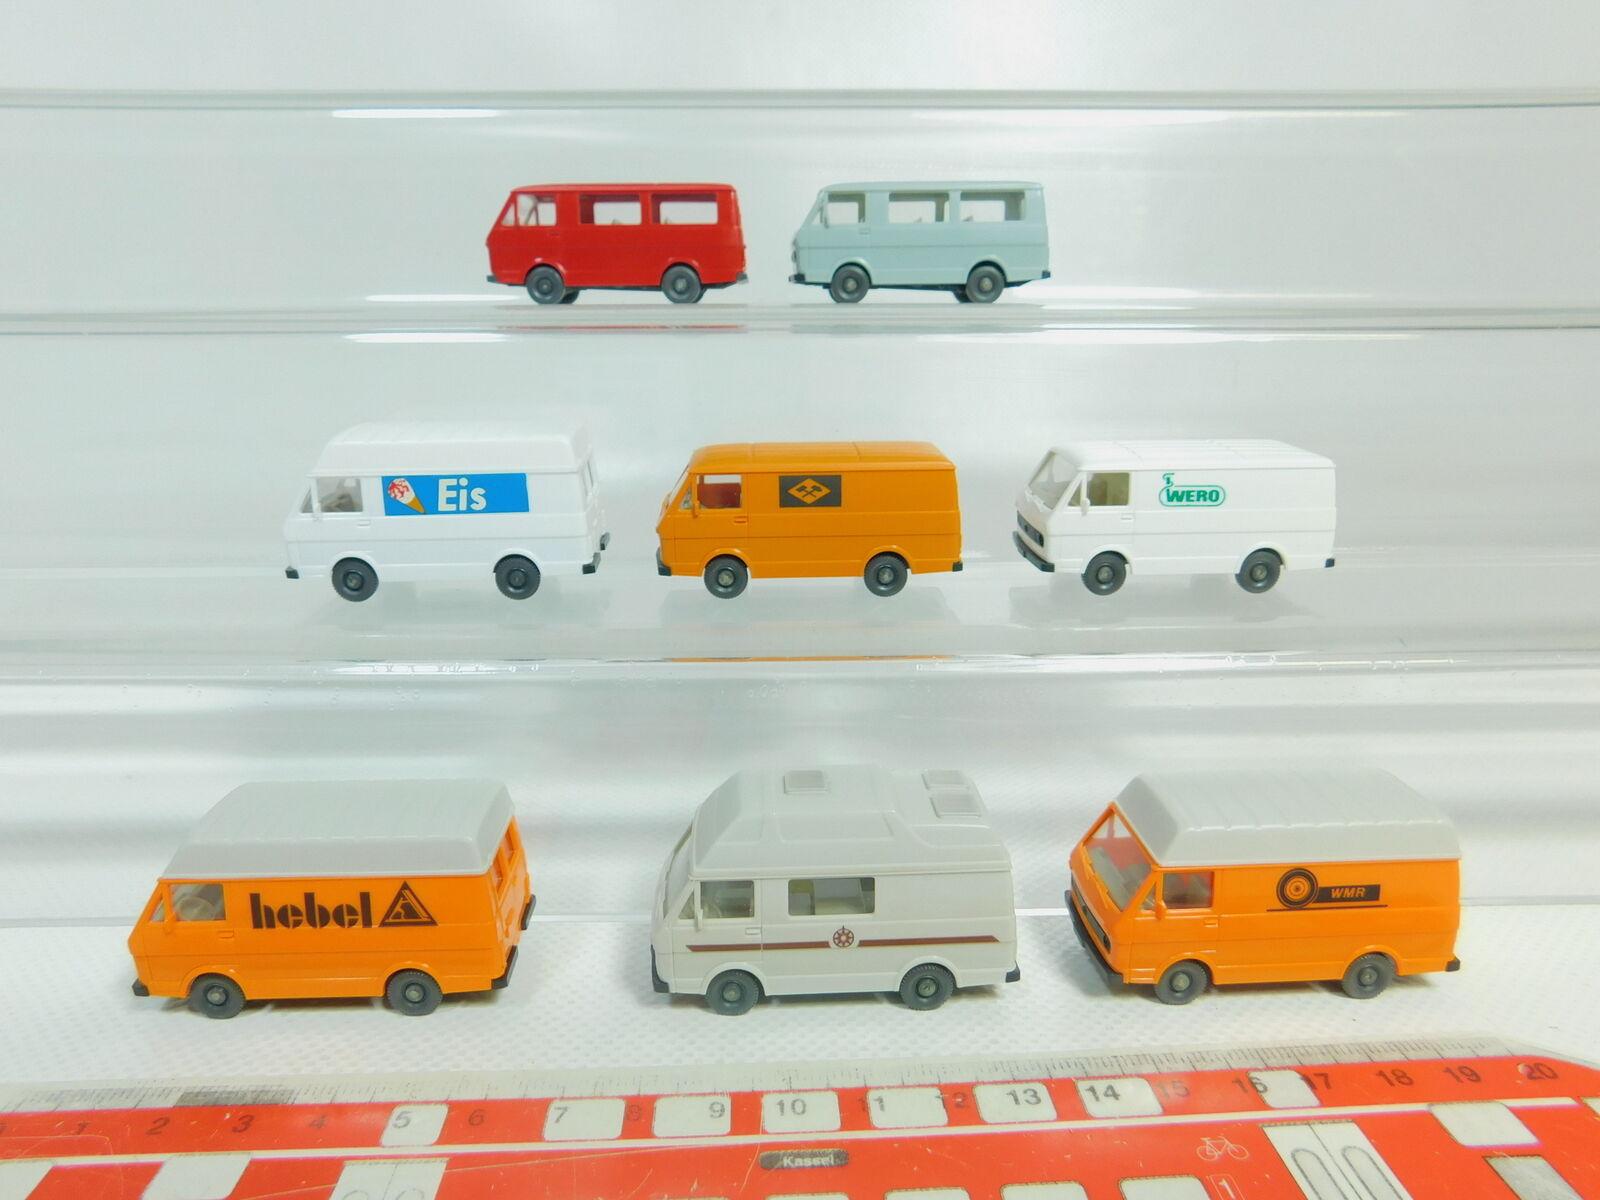 BO565-0,5  8x Wiking H0     1 87 Modelo VW Lt 28  Helado + Palanca + Wero + Wmr b0b601